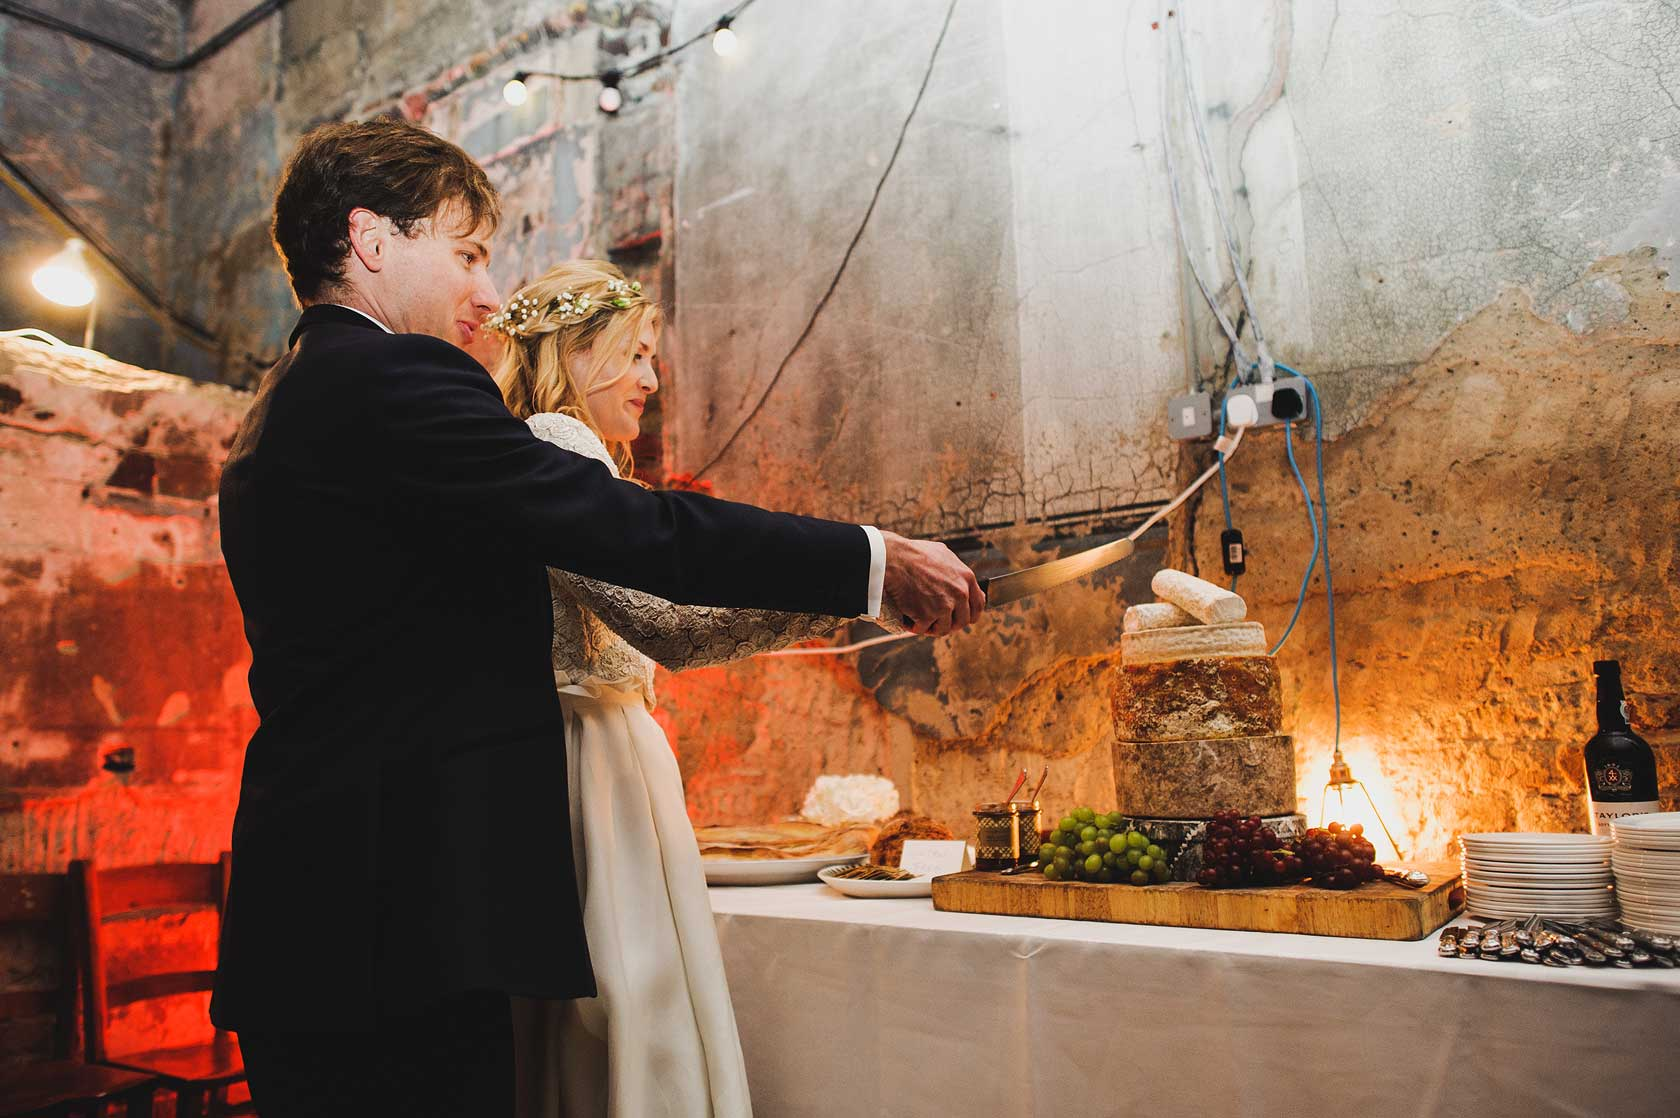 Winter Wedding Photography at Asylum